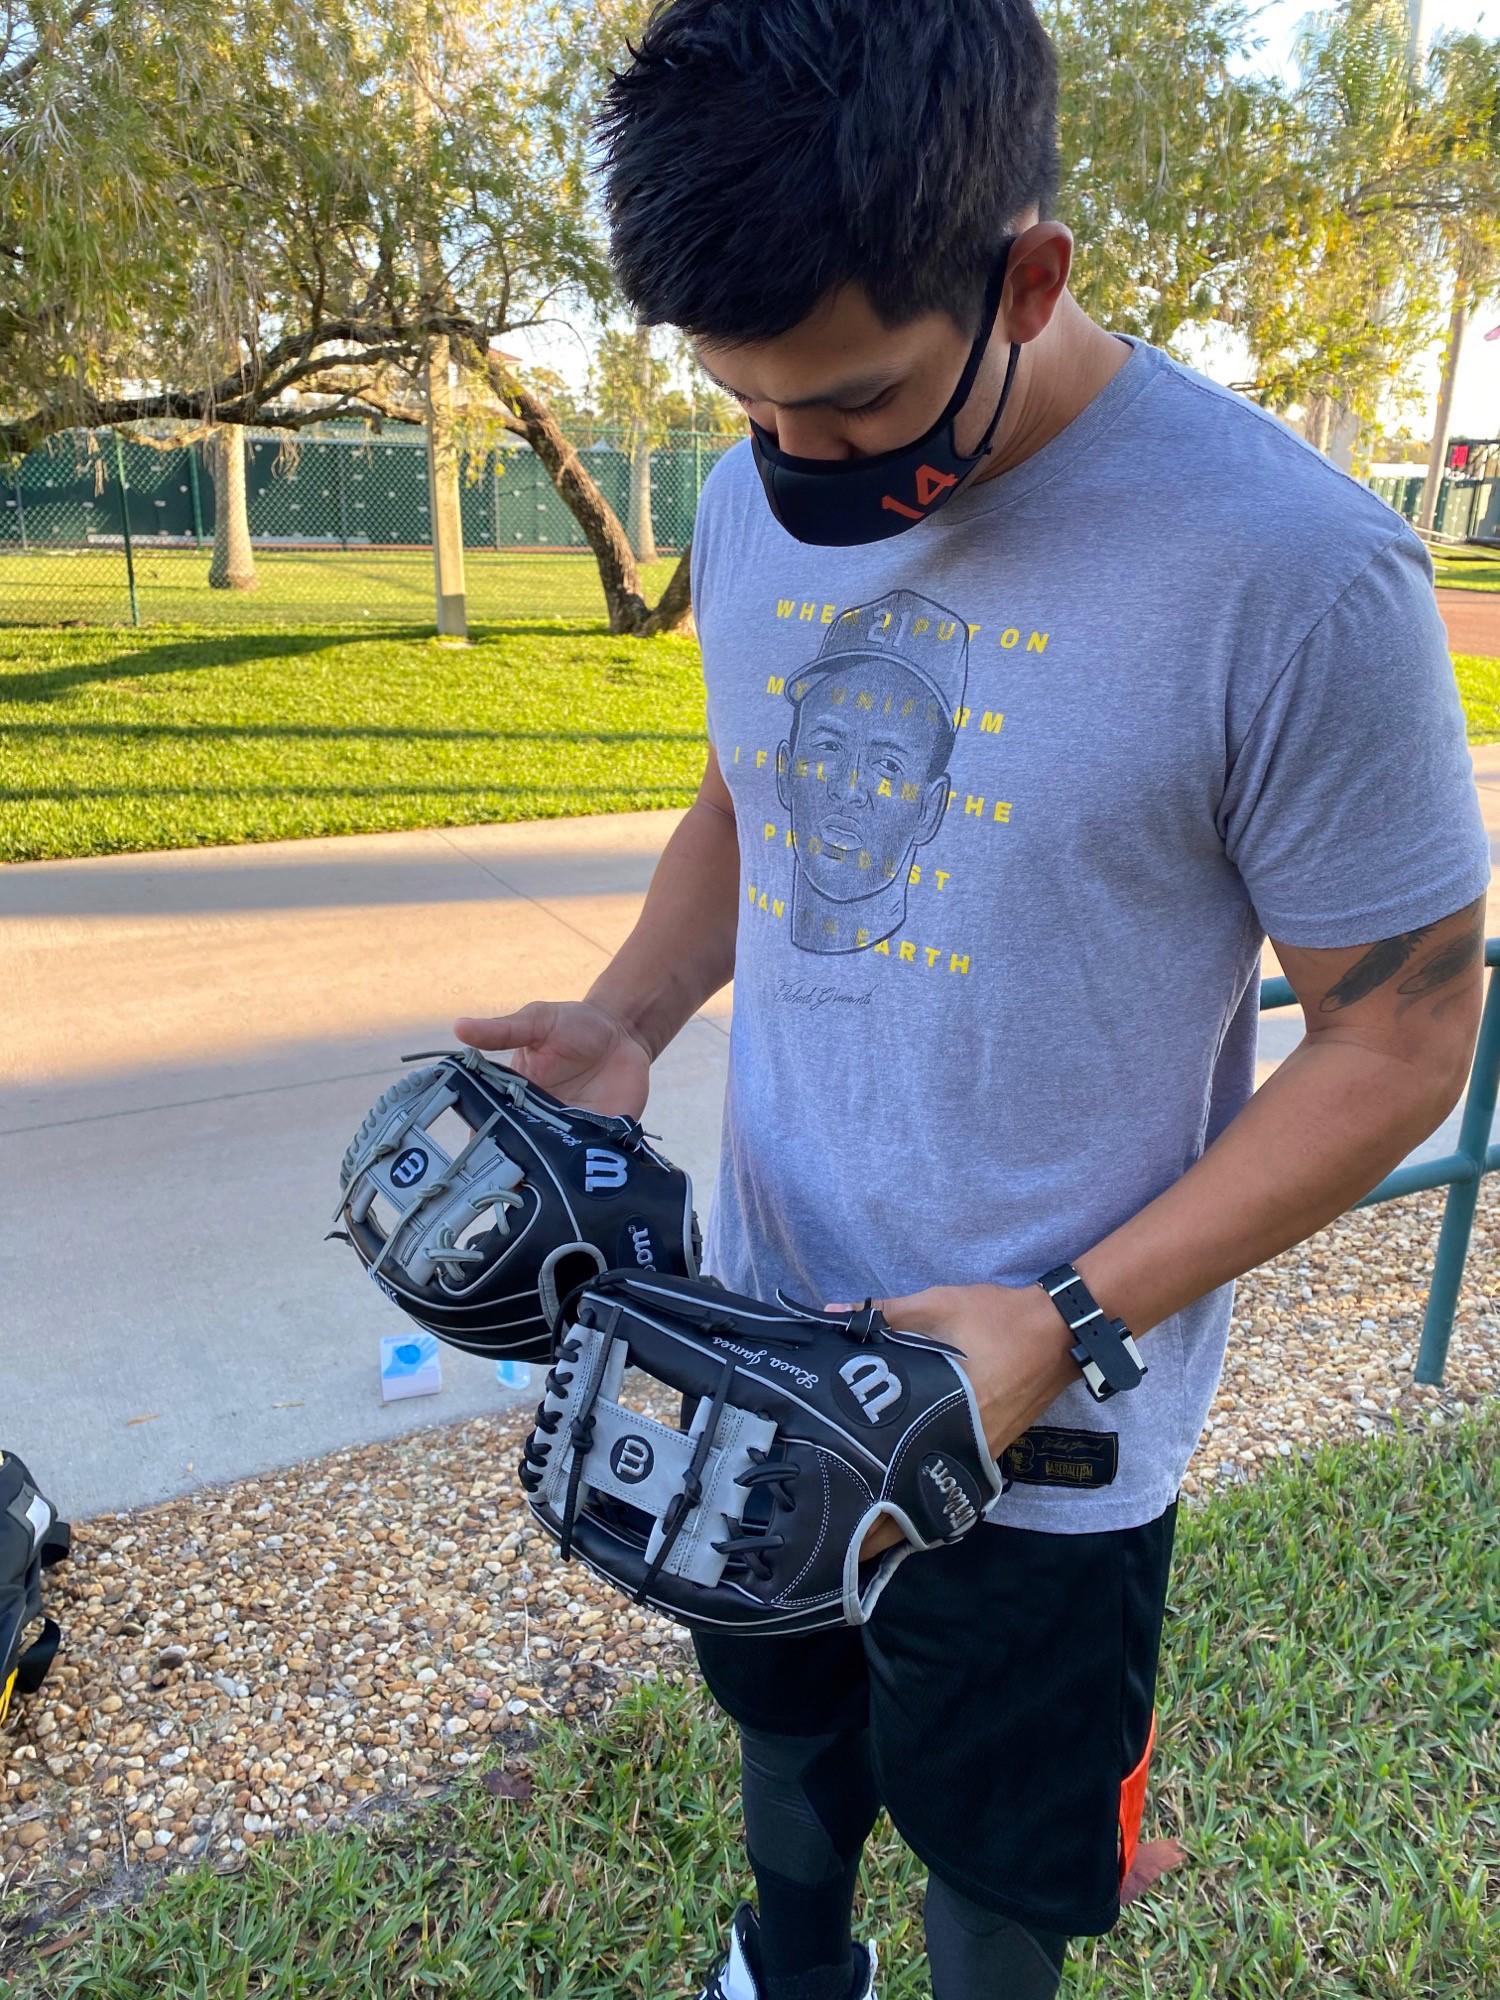 Rio Ruiz holding two wilson ball gloves